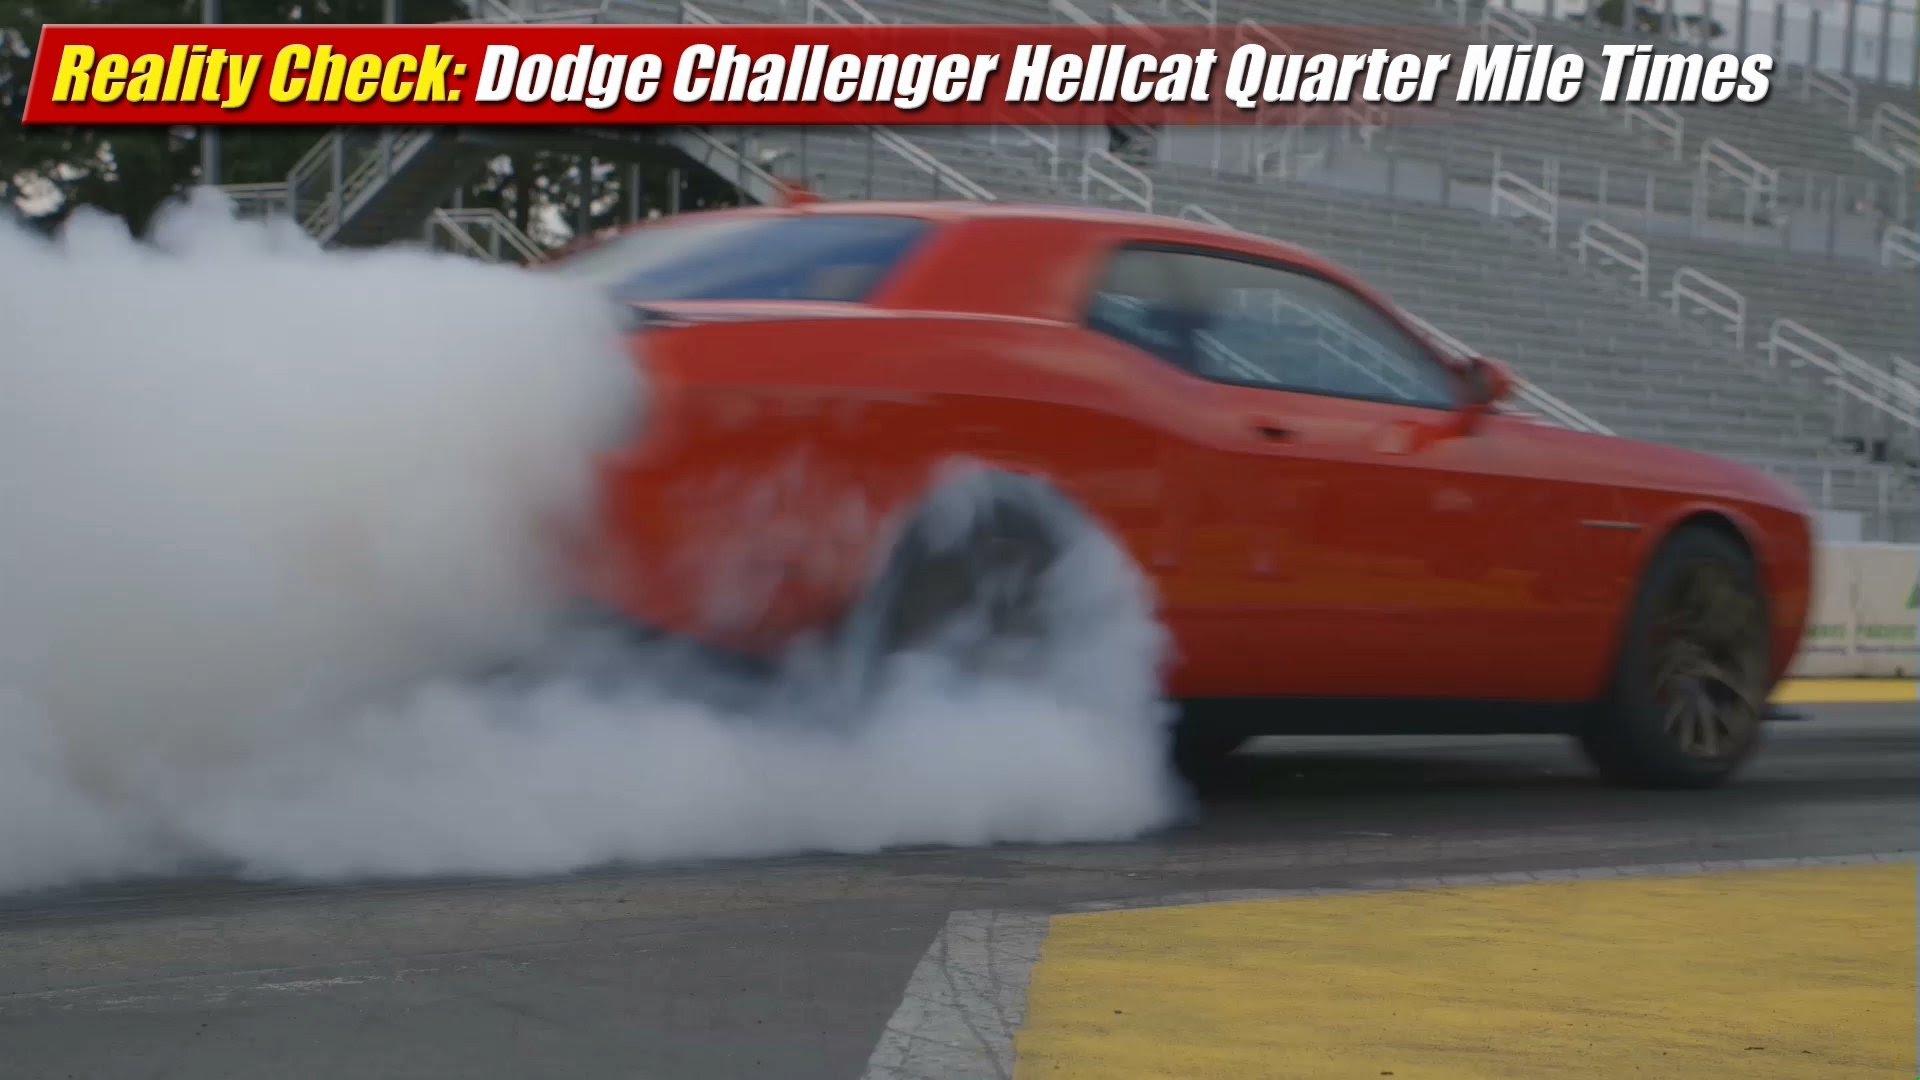 Reality Check Dodge Challenger Srt Hellcat Quarter Mile